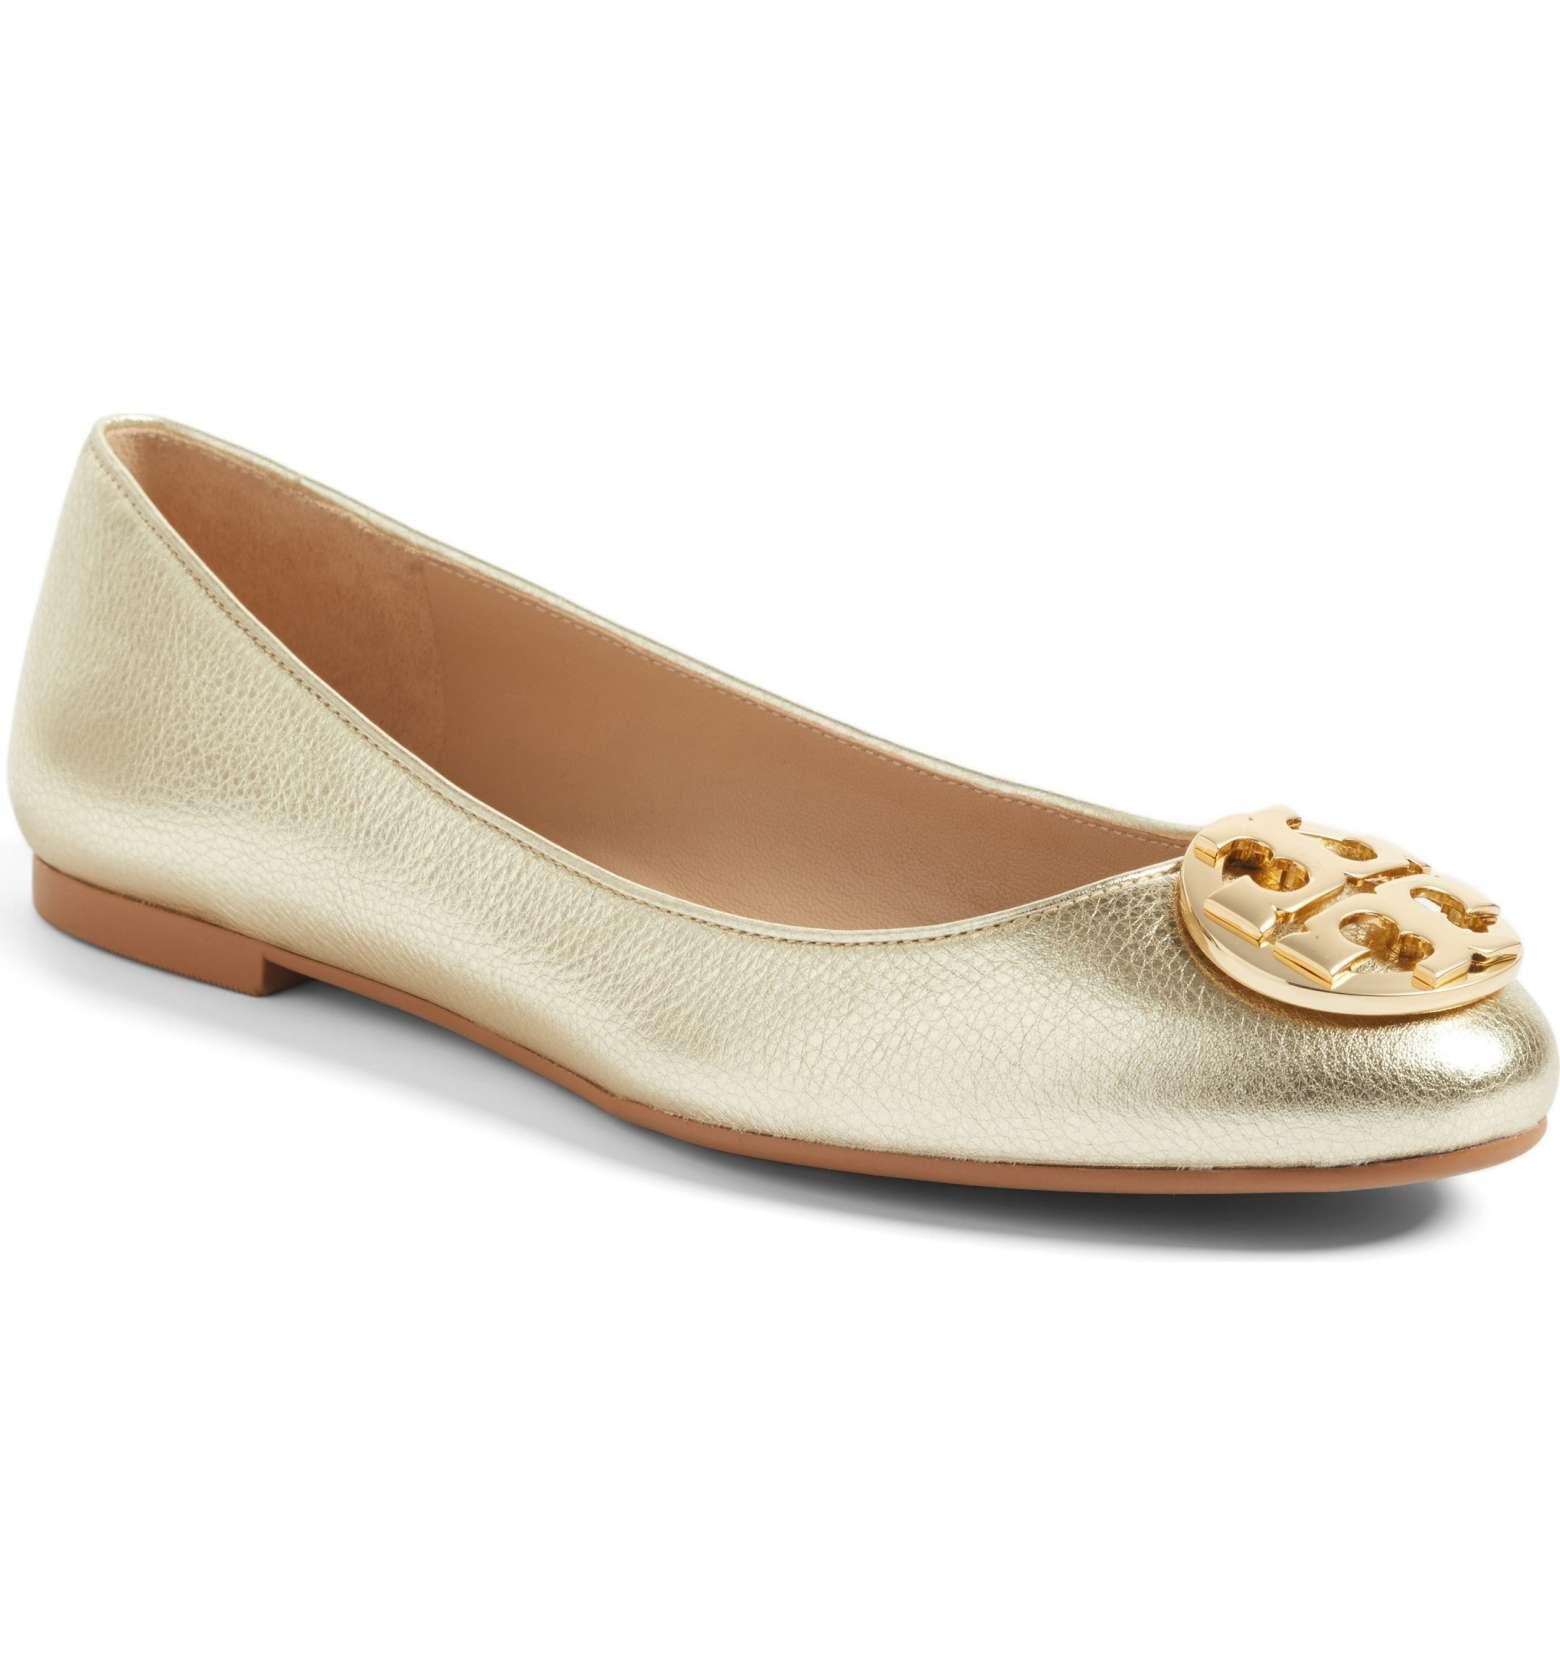 677752944790 Tory Burch Claire Ballerina Flats